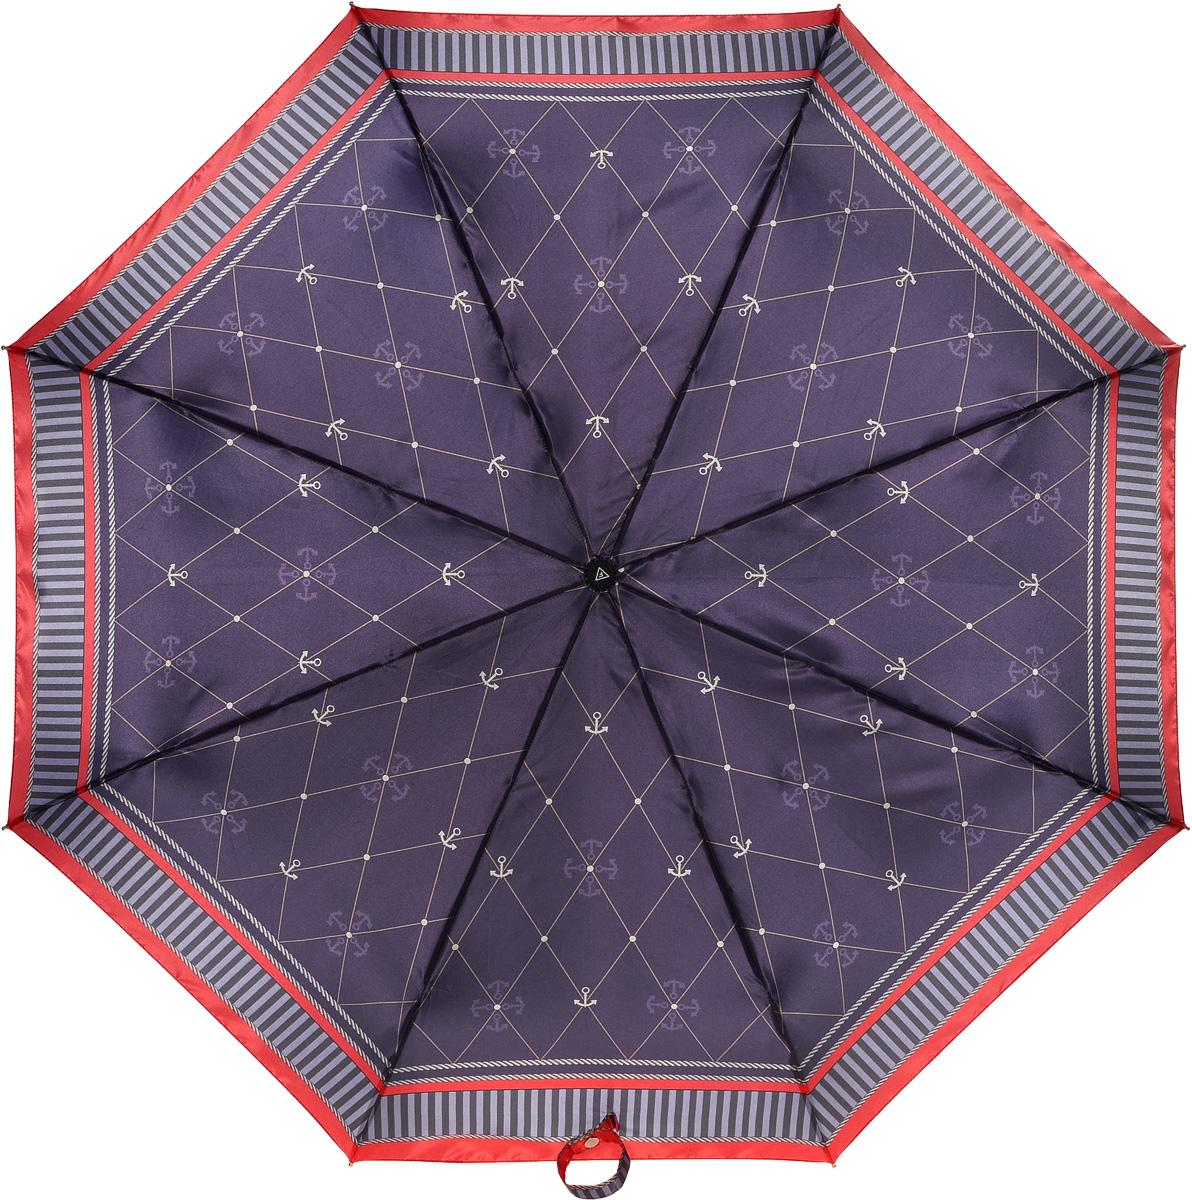 Зонт женский Fabretti, автомат, 3 сложения, цвет: мультиколор. L-16105-6L-16105-6Зонт женский Fabretti, облегченный суперавтомат, 3 сложения